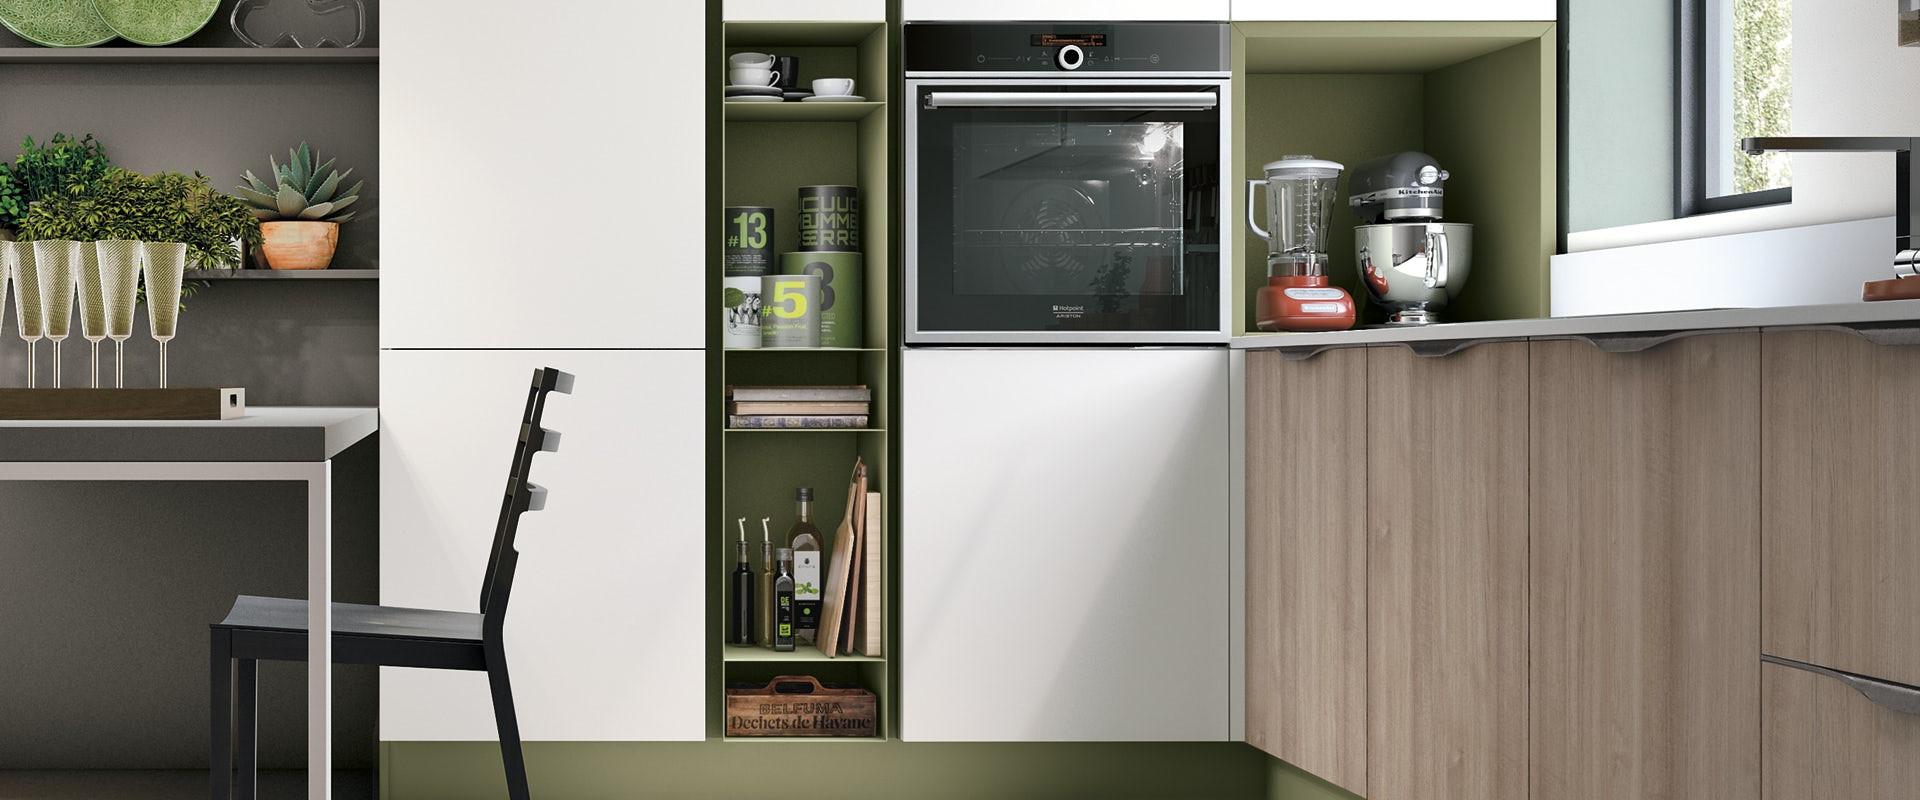 stosa-cucine-moderne-aliant-209.jpg